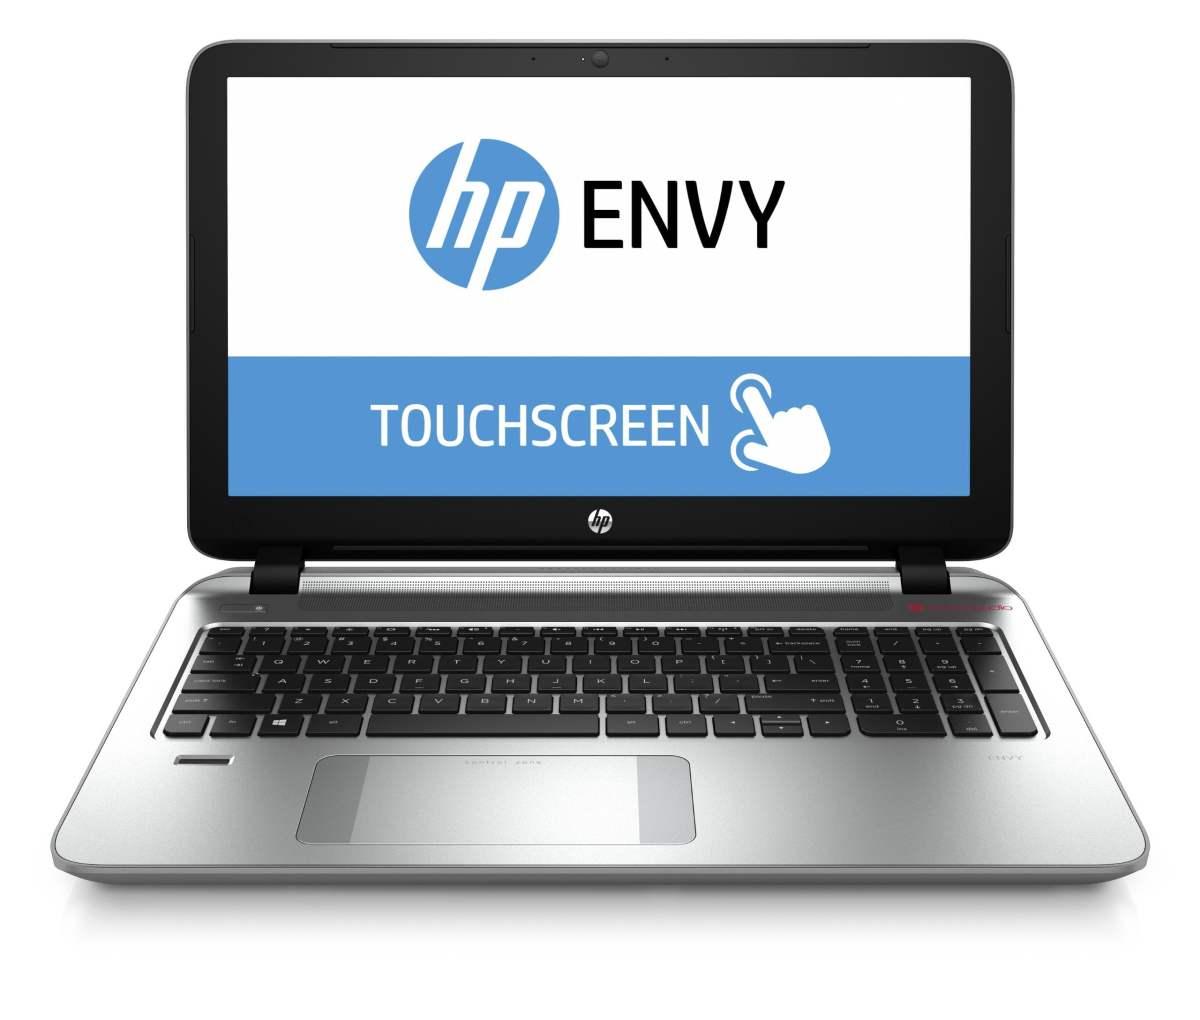 HP Envy 15 TouchSmart Core i7